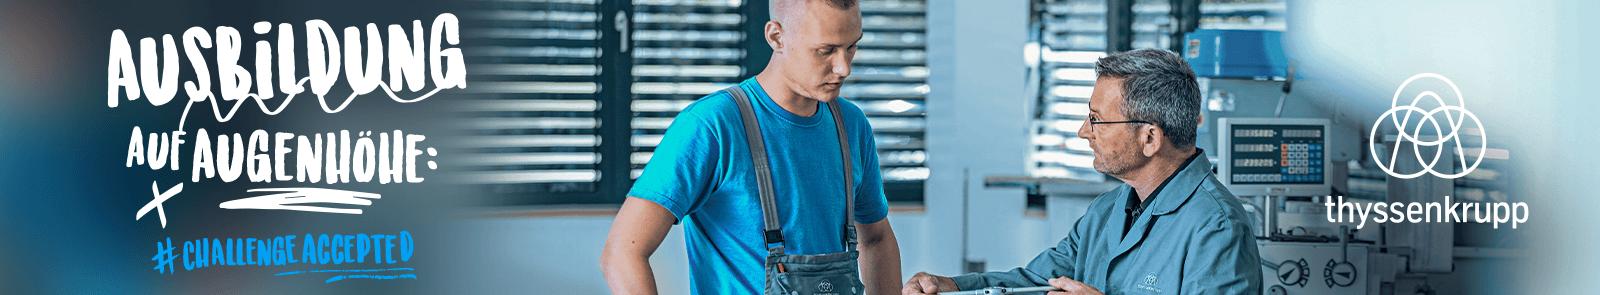 Ausbildung zum Zerspanungs-/Industriemechaniker (m/w/d)